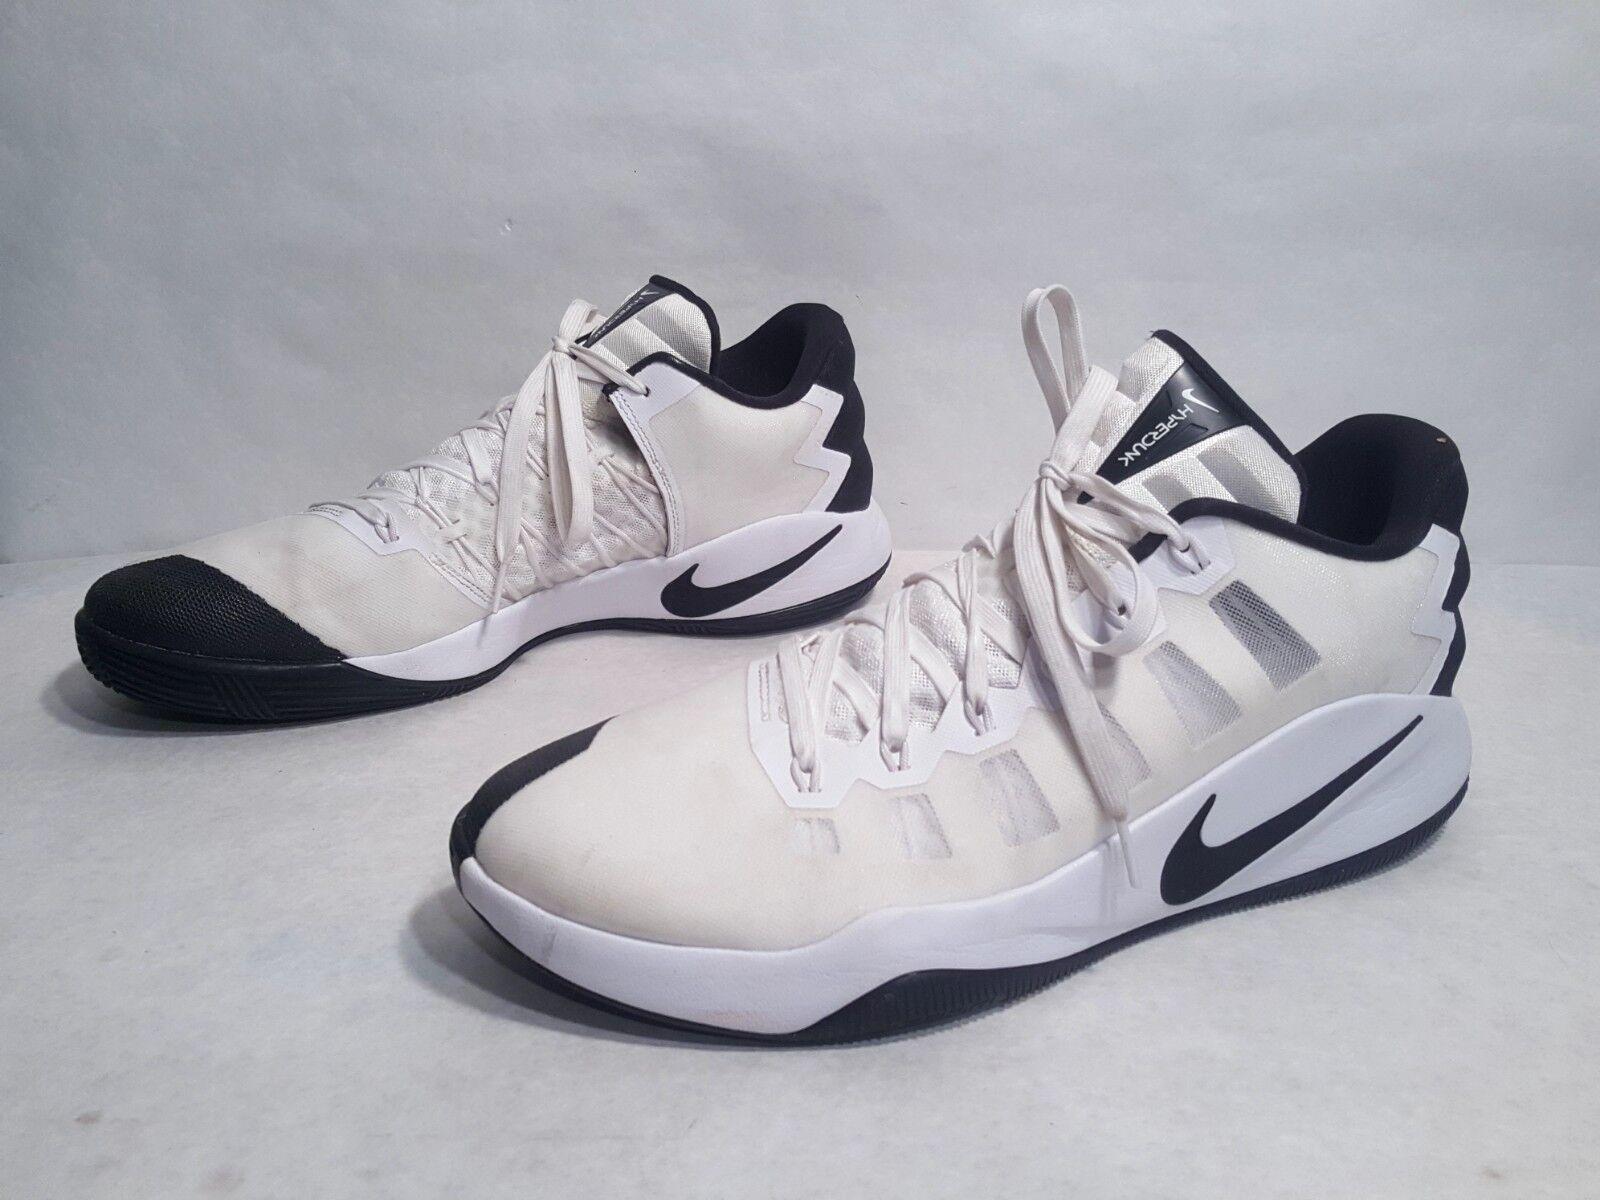 EUC Nike Hyperdunk 2016 Ivory White Black Low Top Basketball shoes US 14